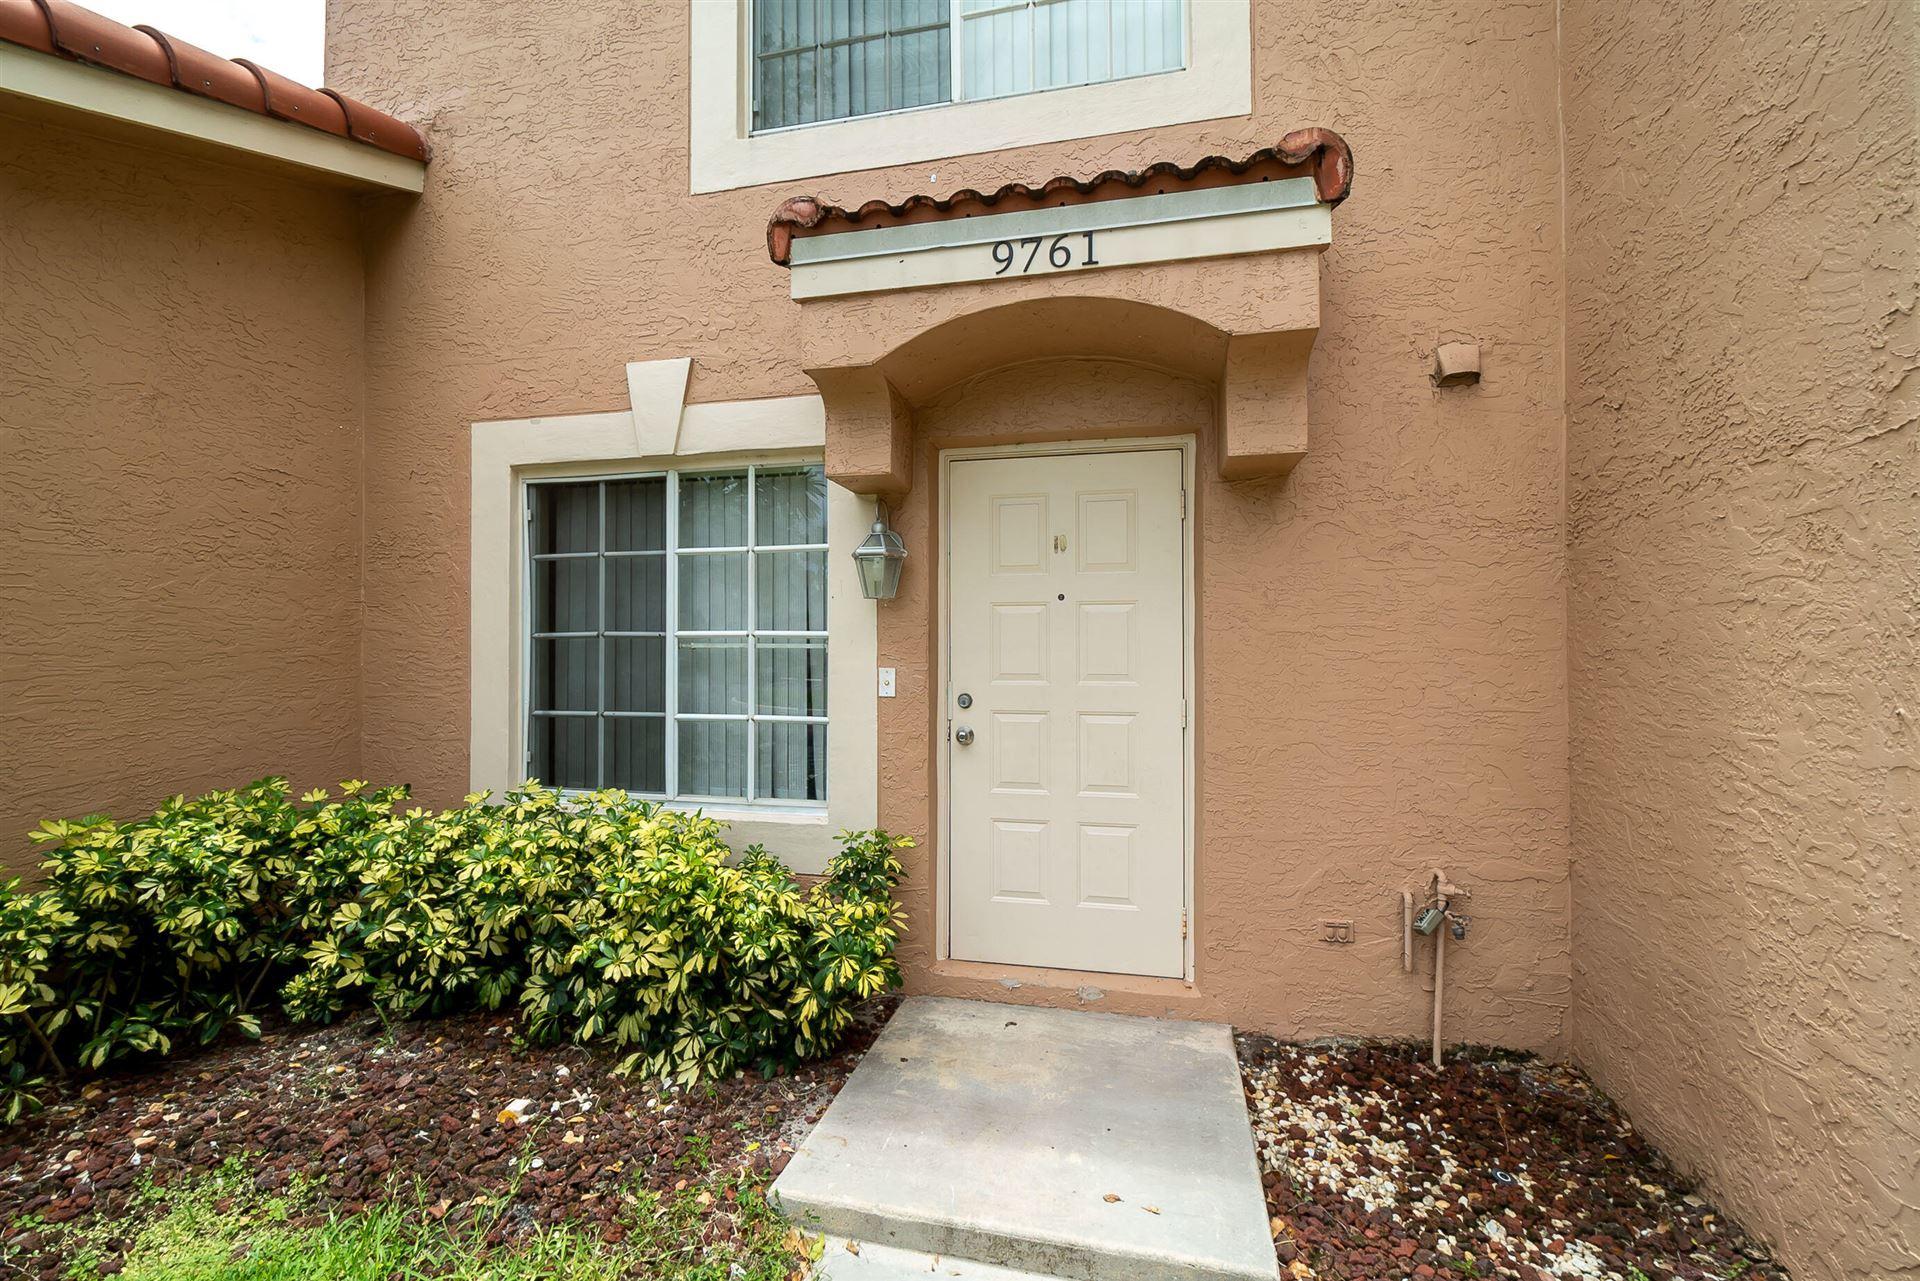 9761 Kamena Circle, Boynton Beach, FL 33436 - MLS#: RX-10730987